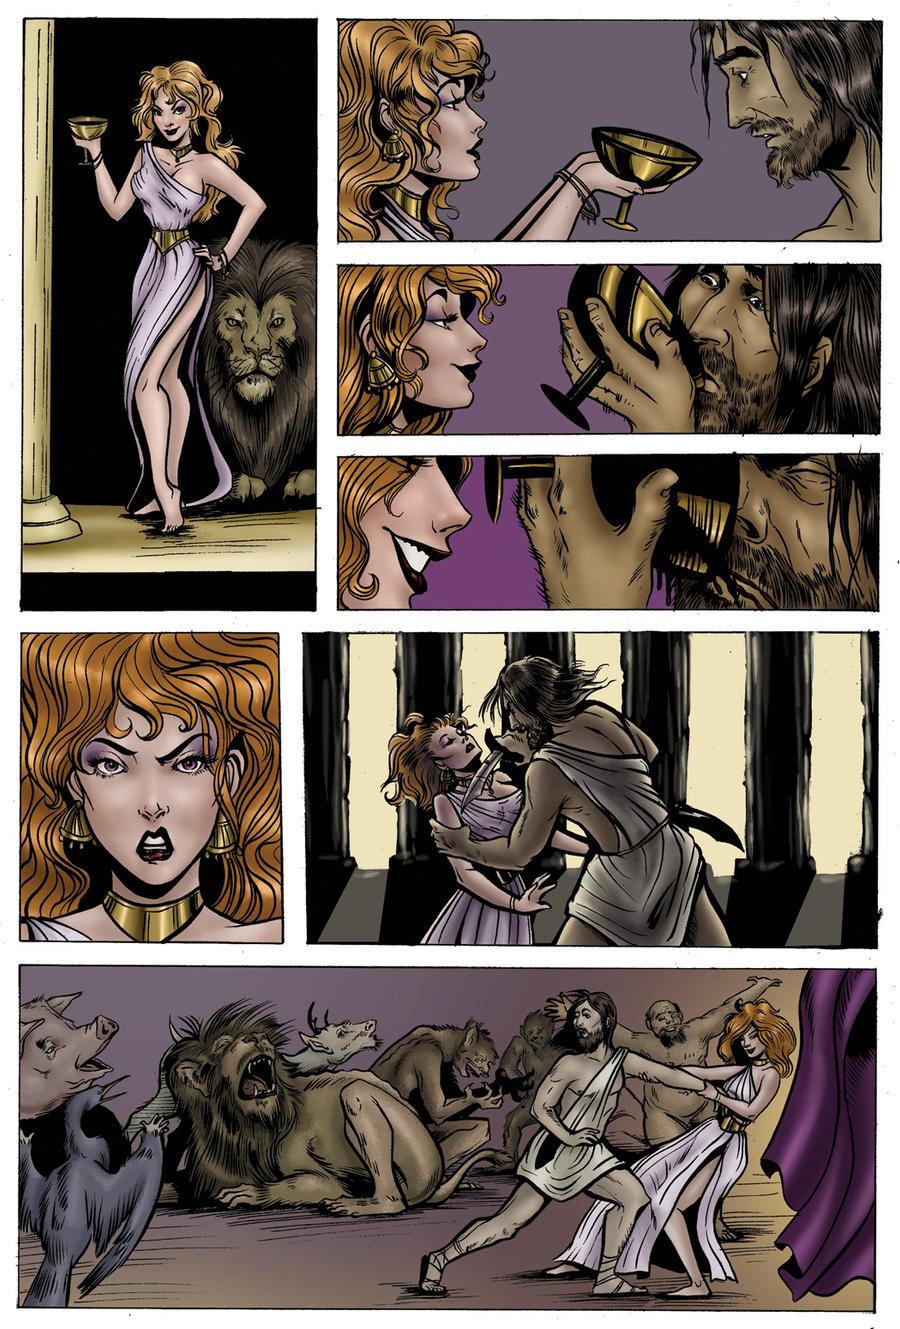 relationship between circe and odysseus comic